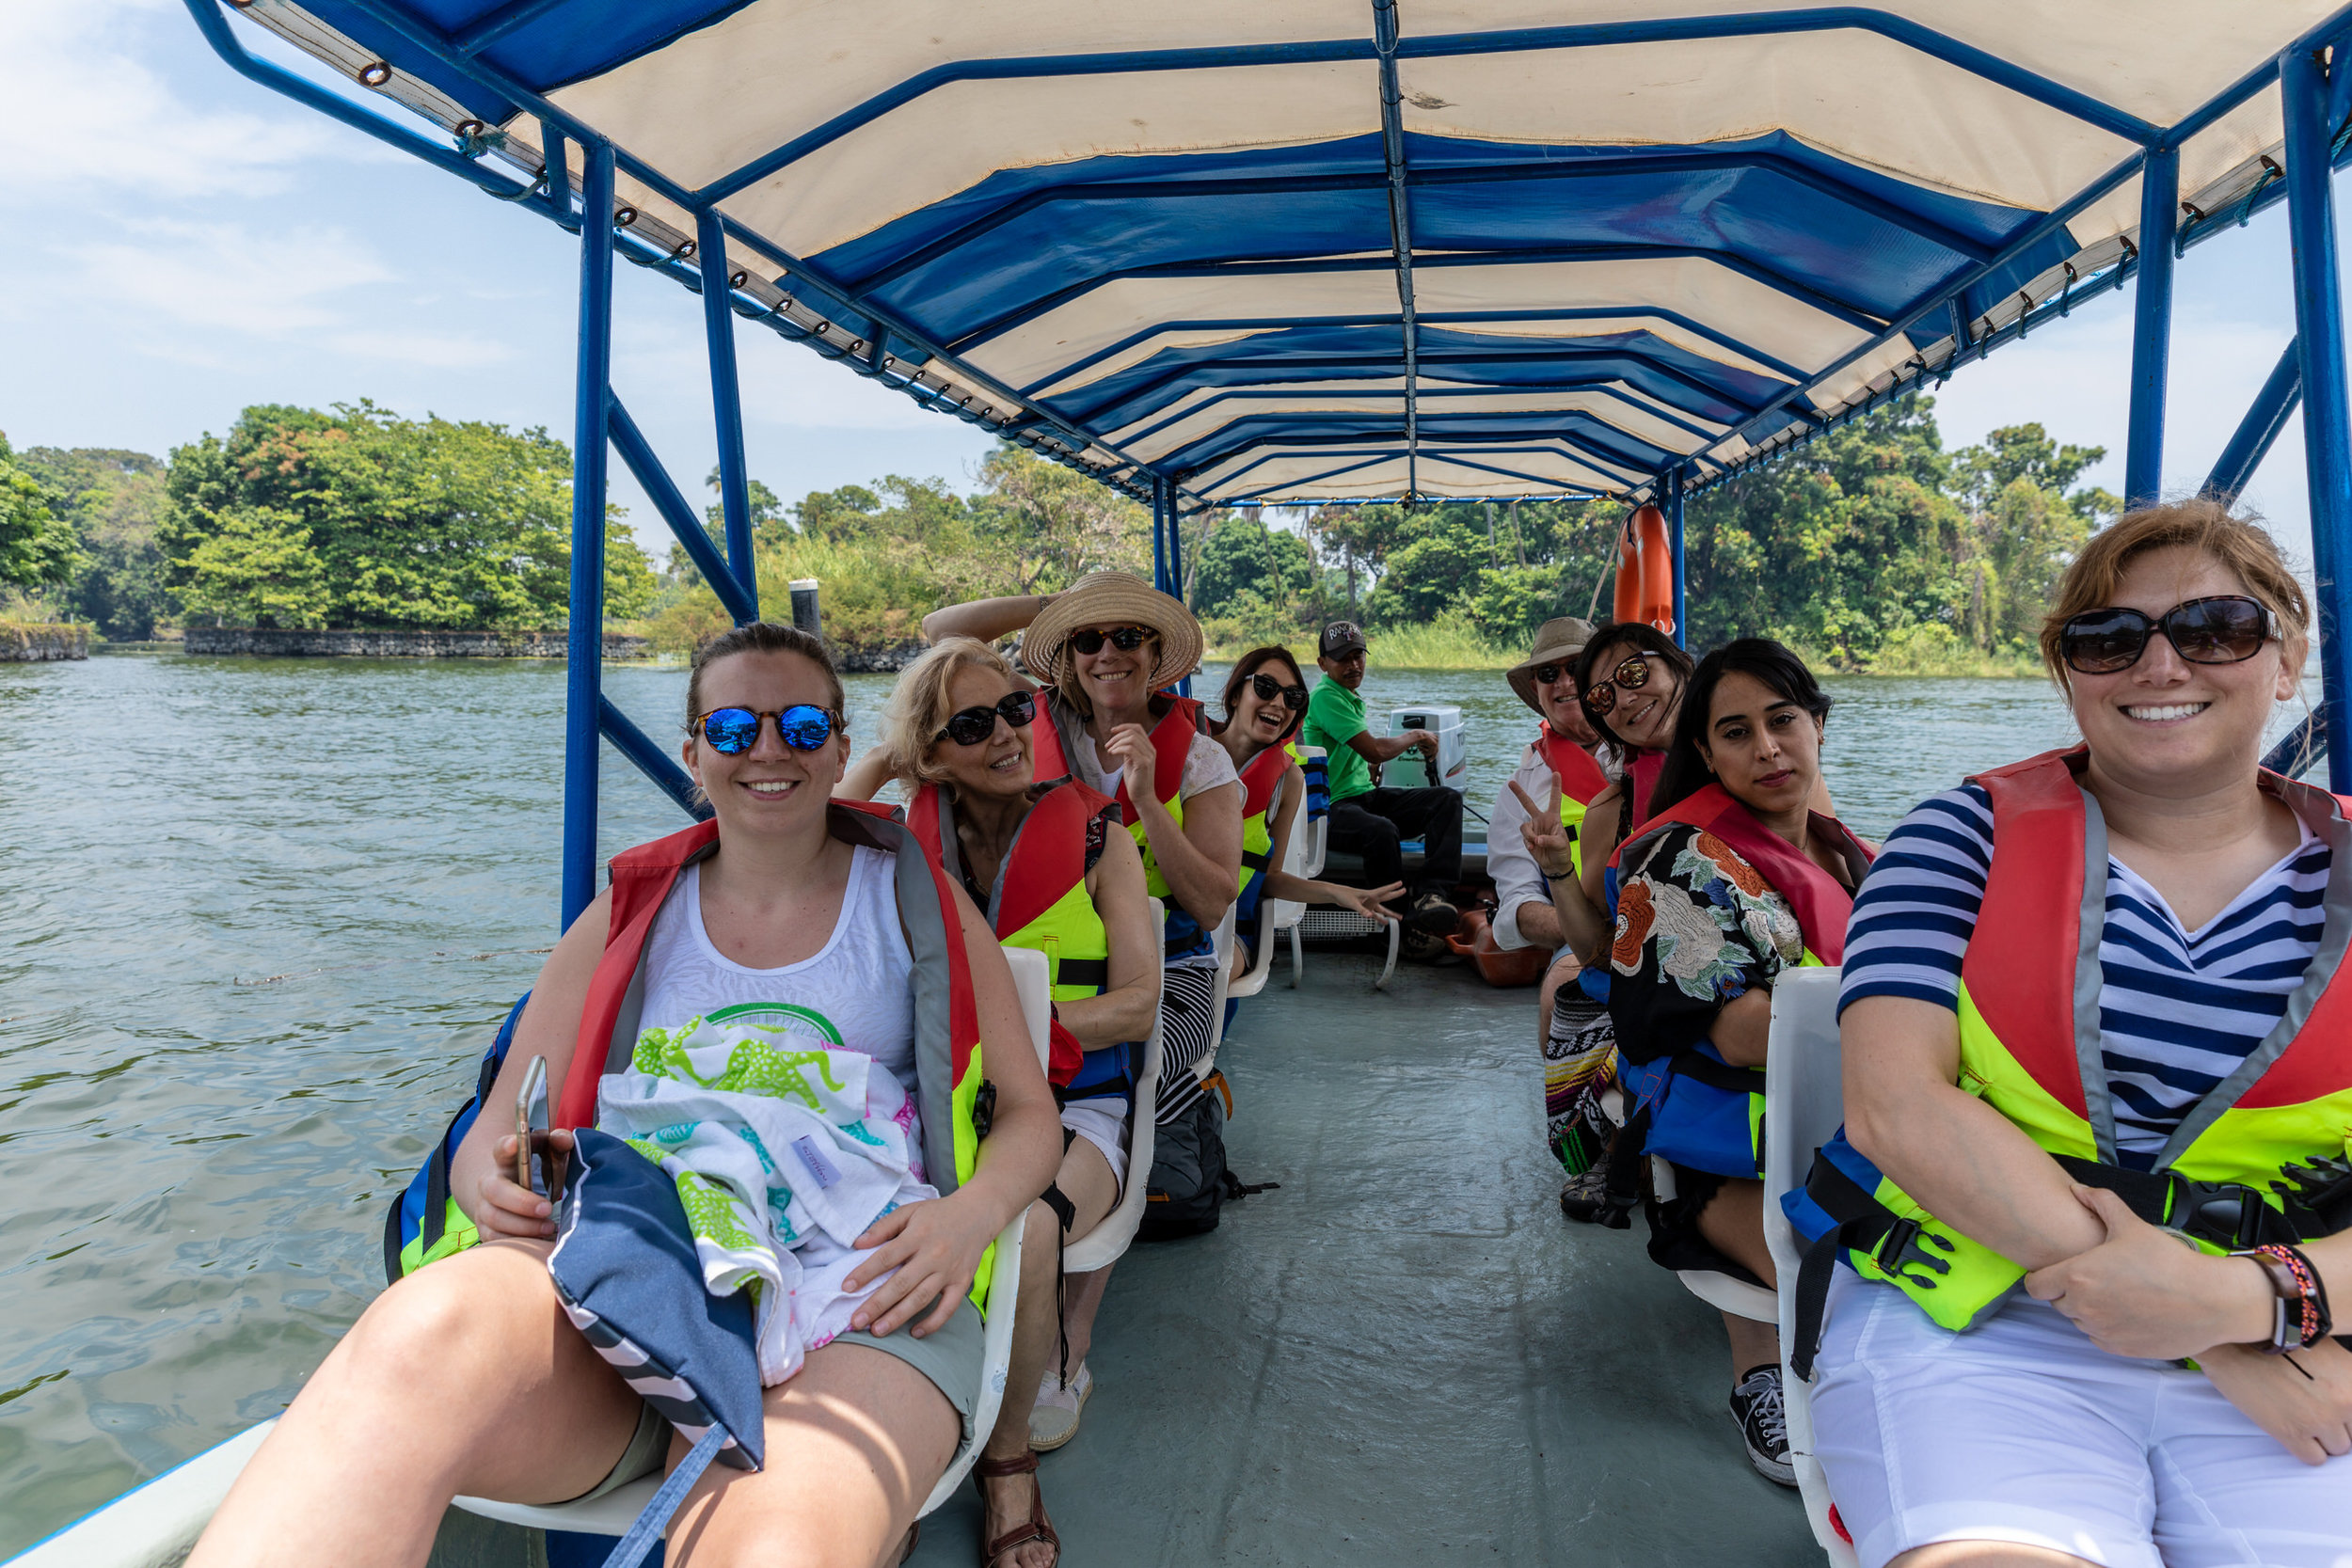 Day 4: Isletas de Granada boat tour